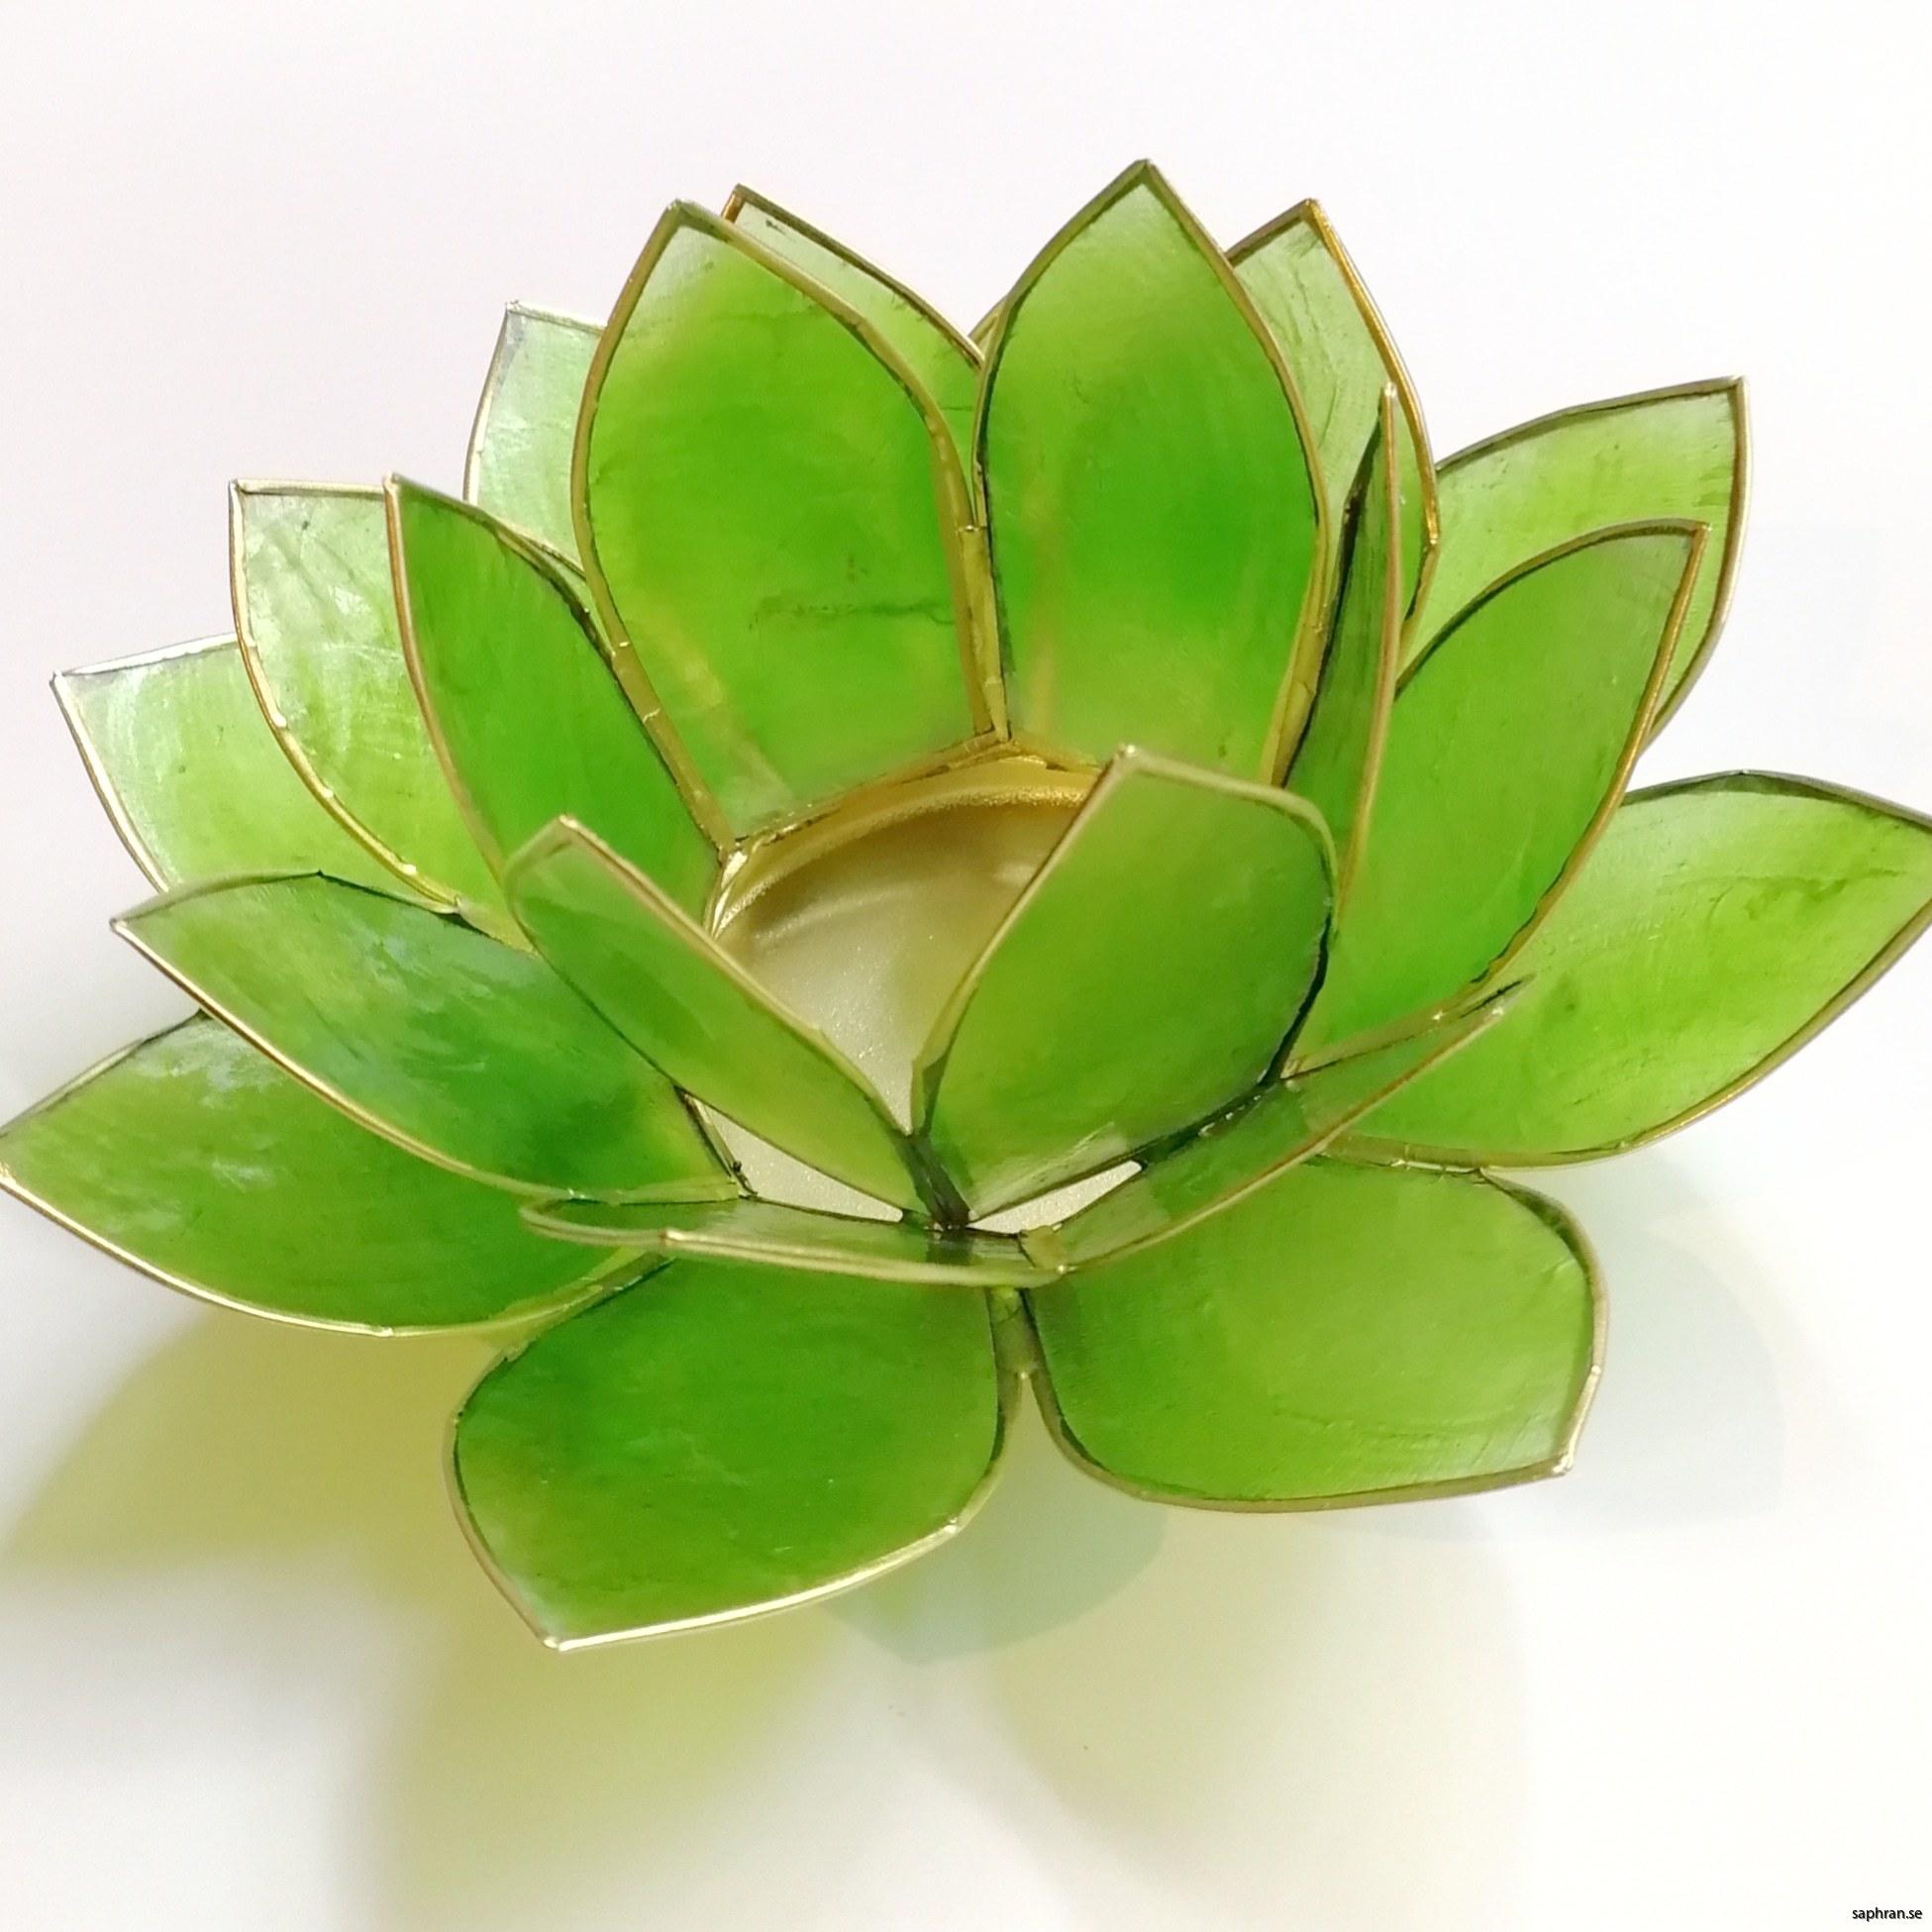 Lotusblomma ljuslykta 7 färger, gron